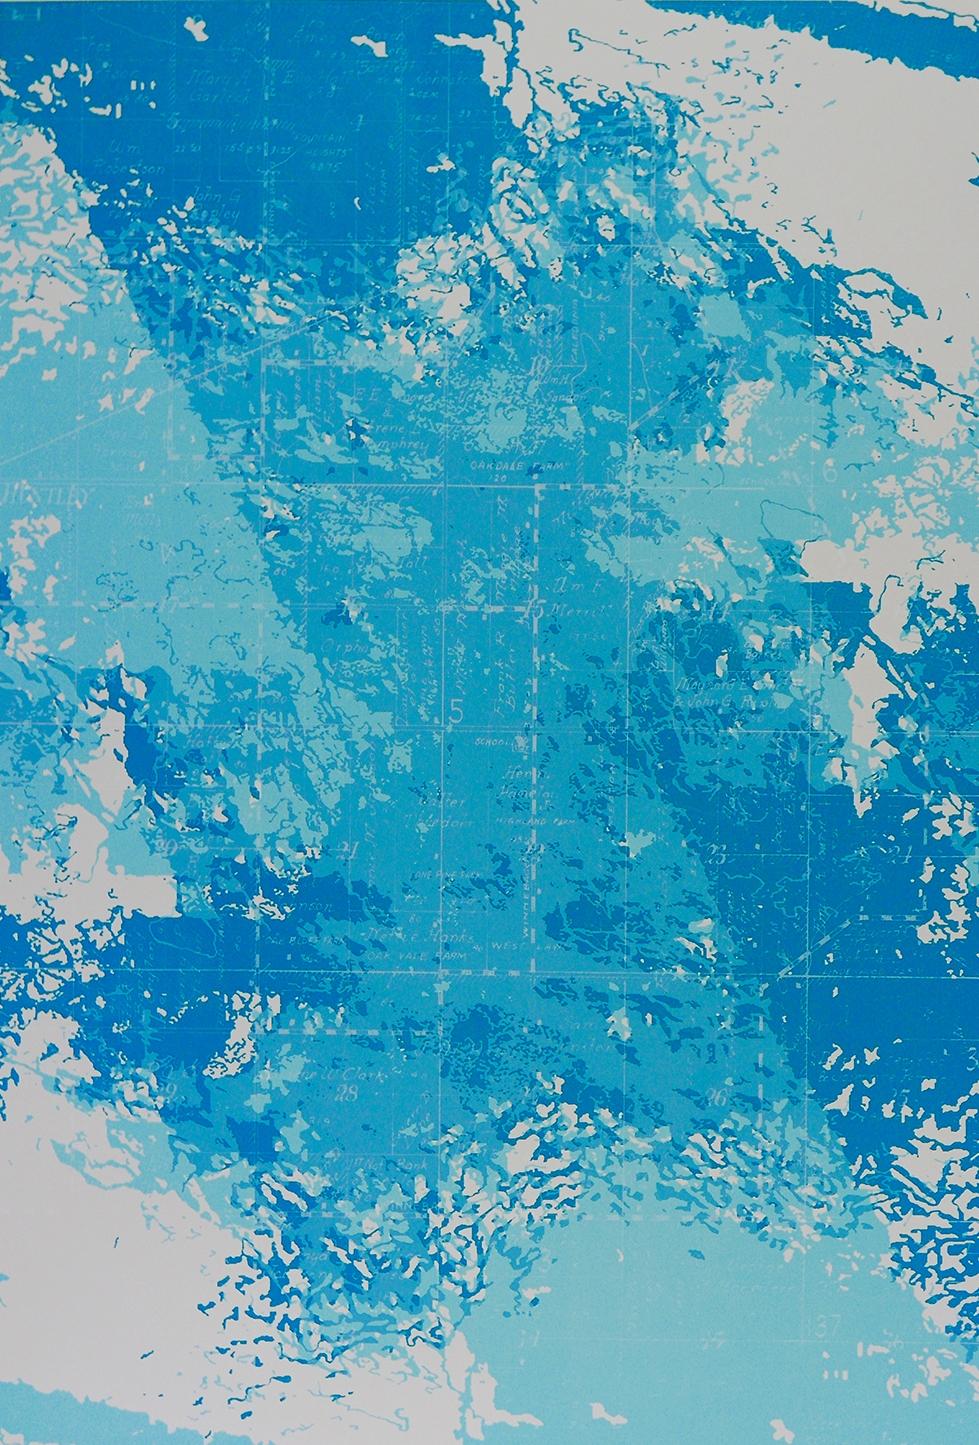 "Inherent   screen print  on Zerkall paper  23"" x 35""  2017  ed. 3"